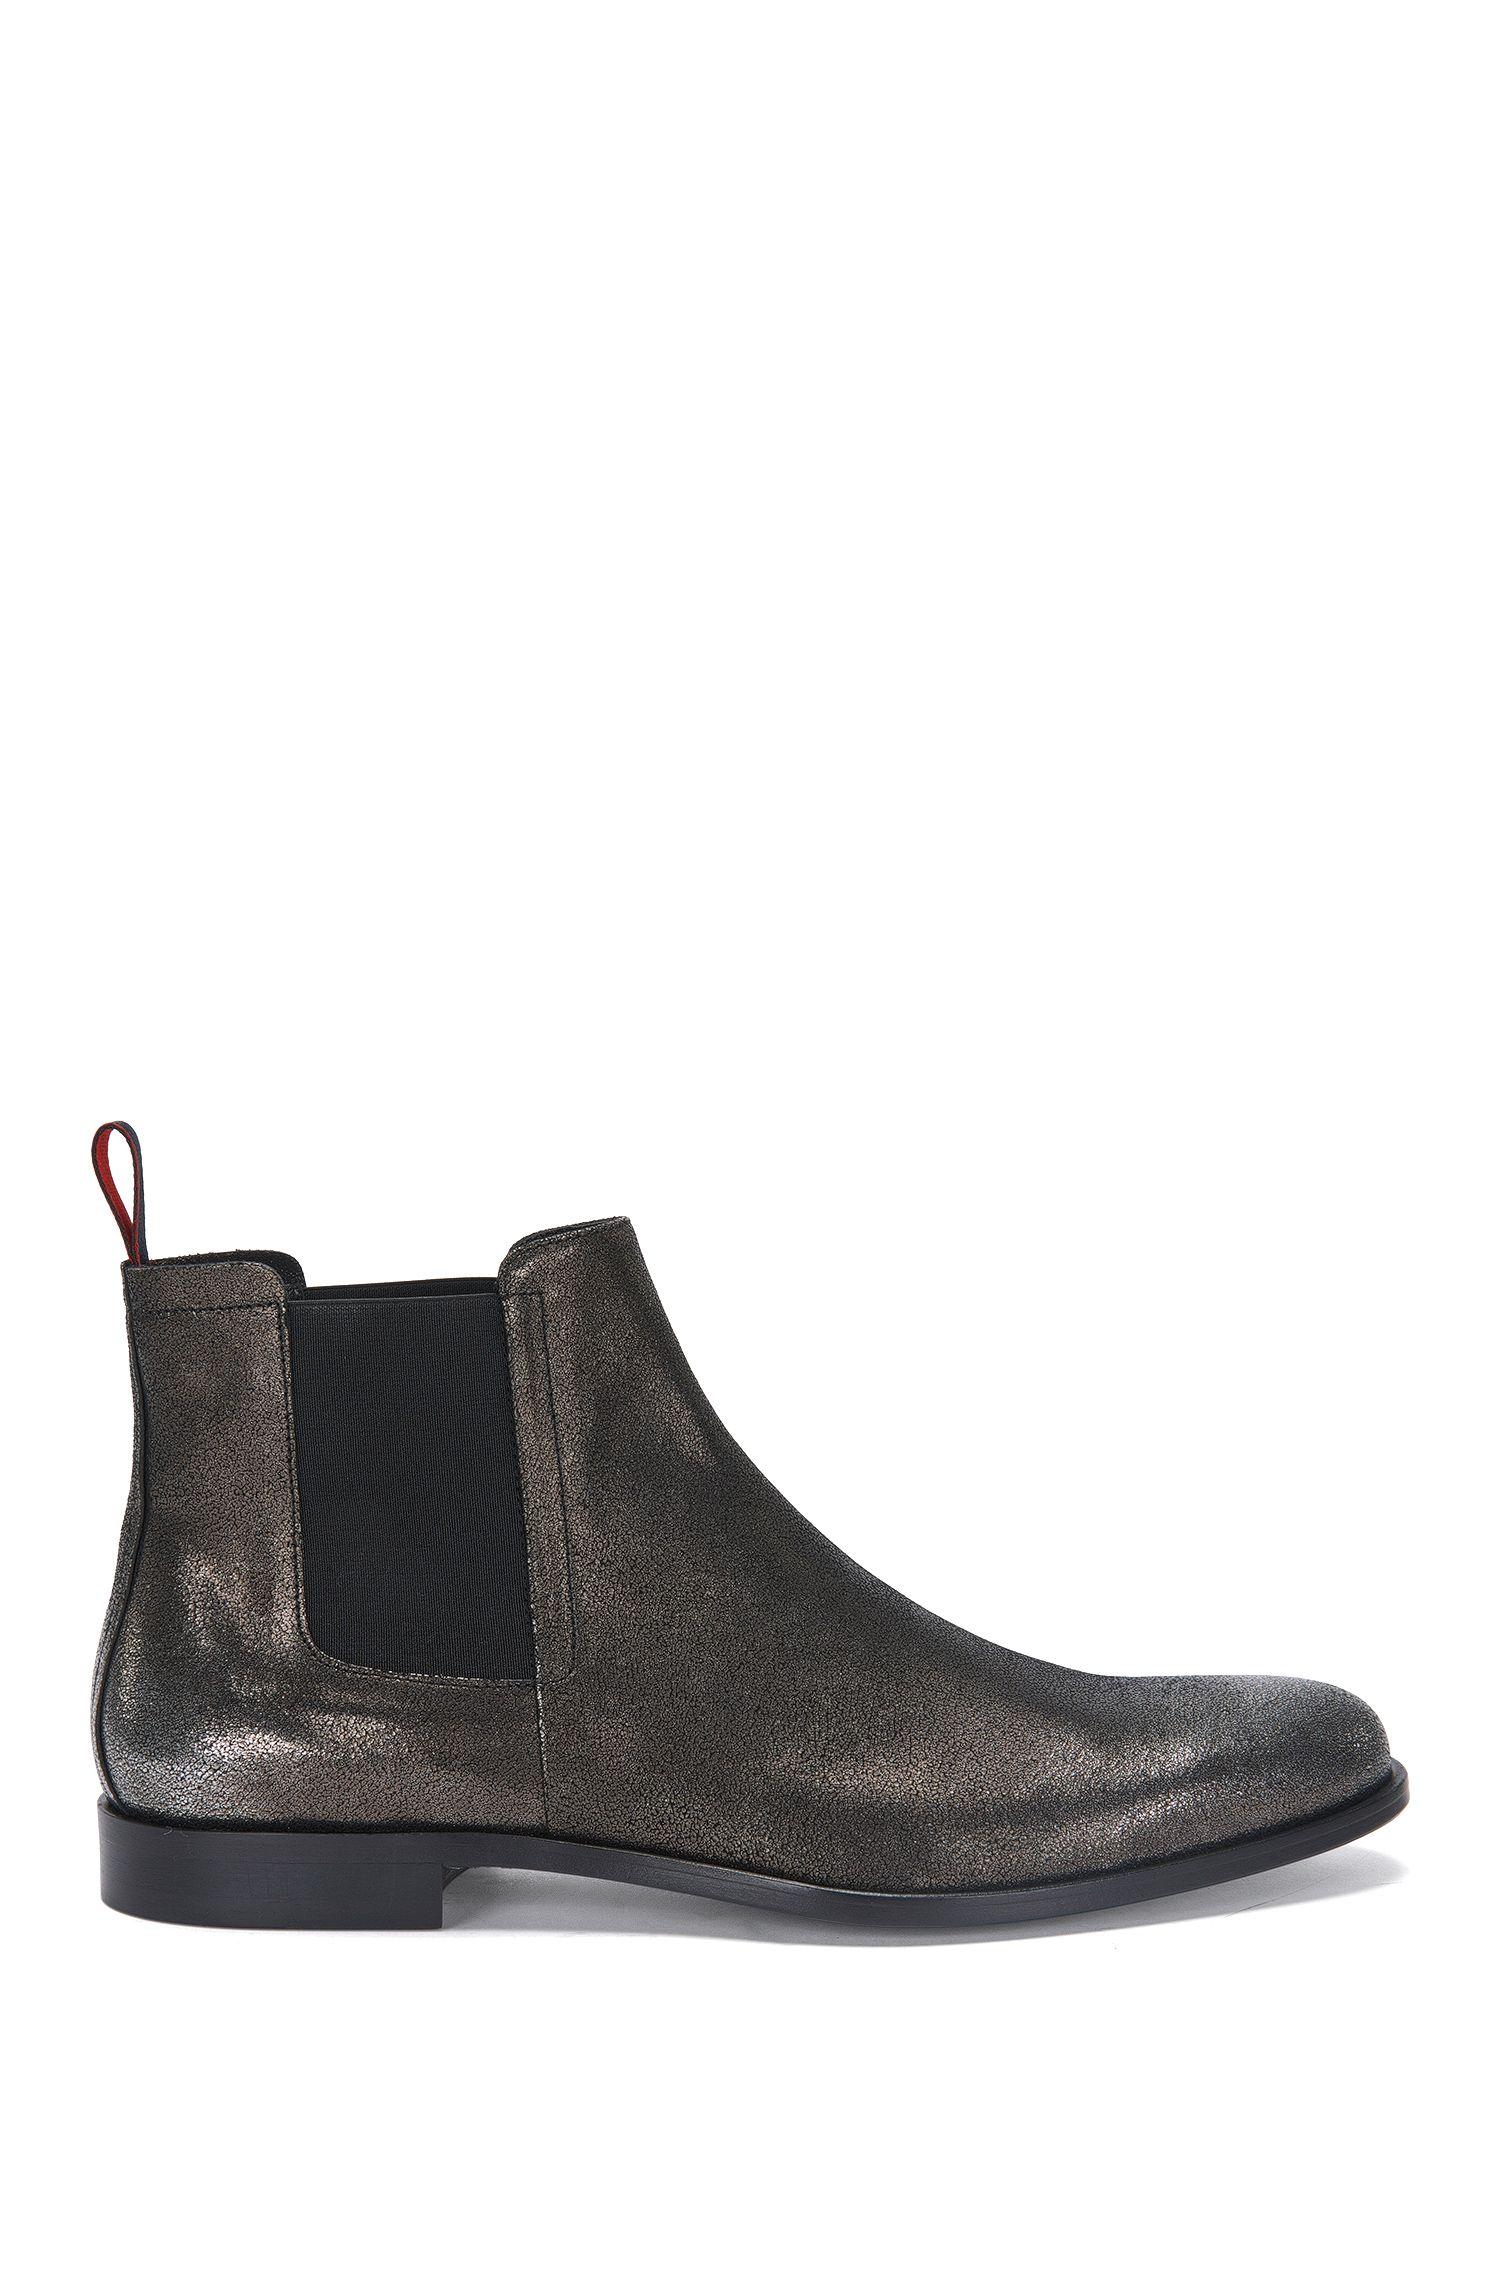 Chelsea Boots aus Leder im Metallic-Look: 'Sigma_Cheb_sdgl'